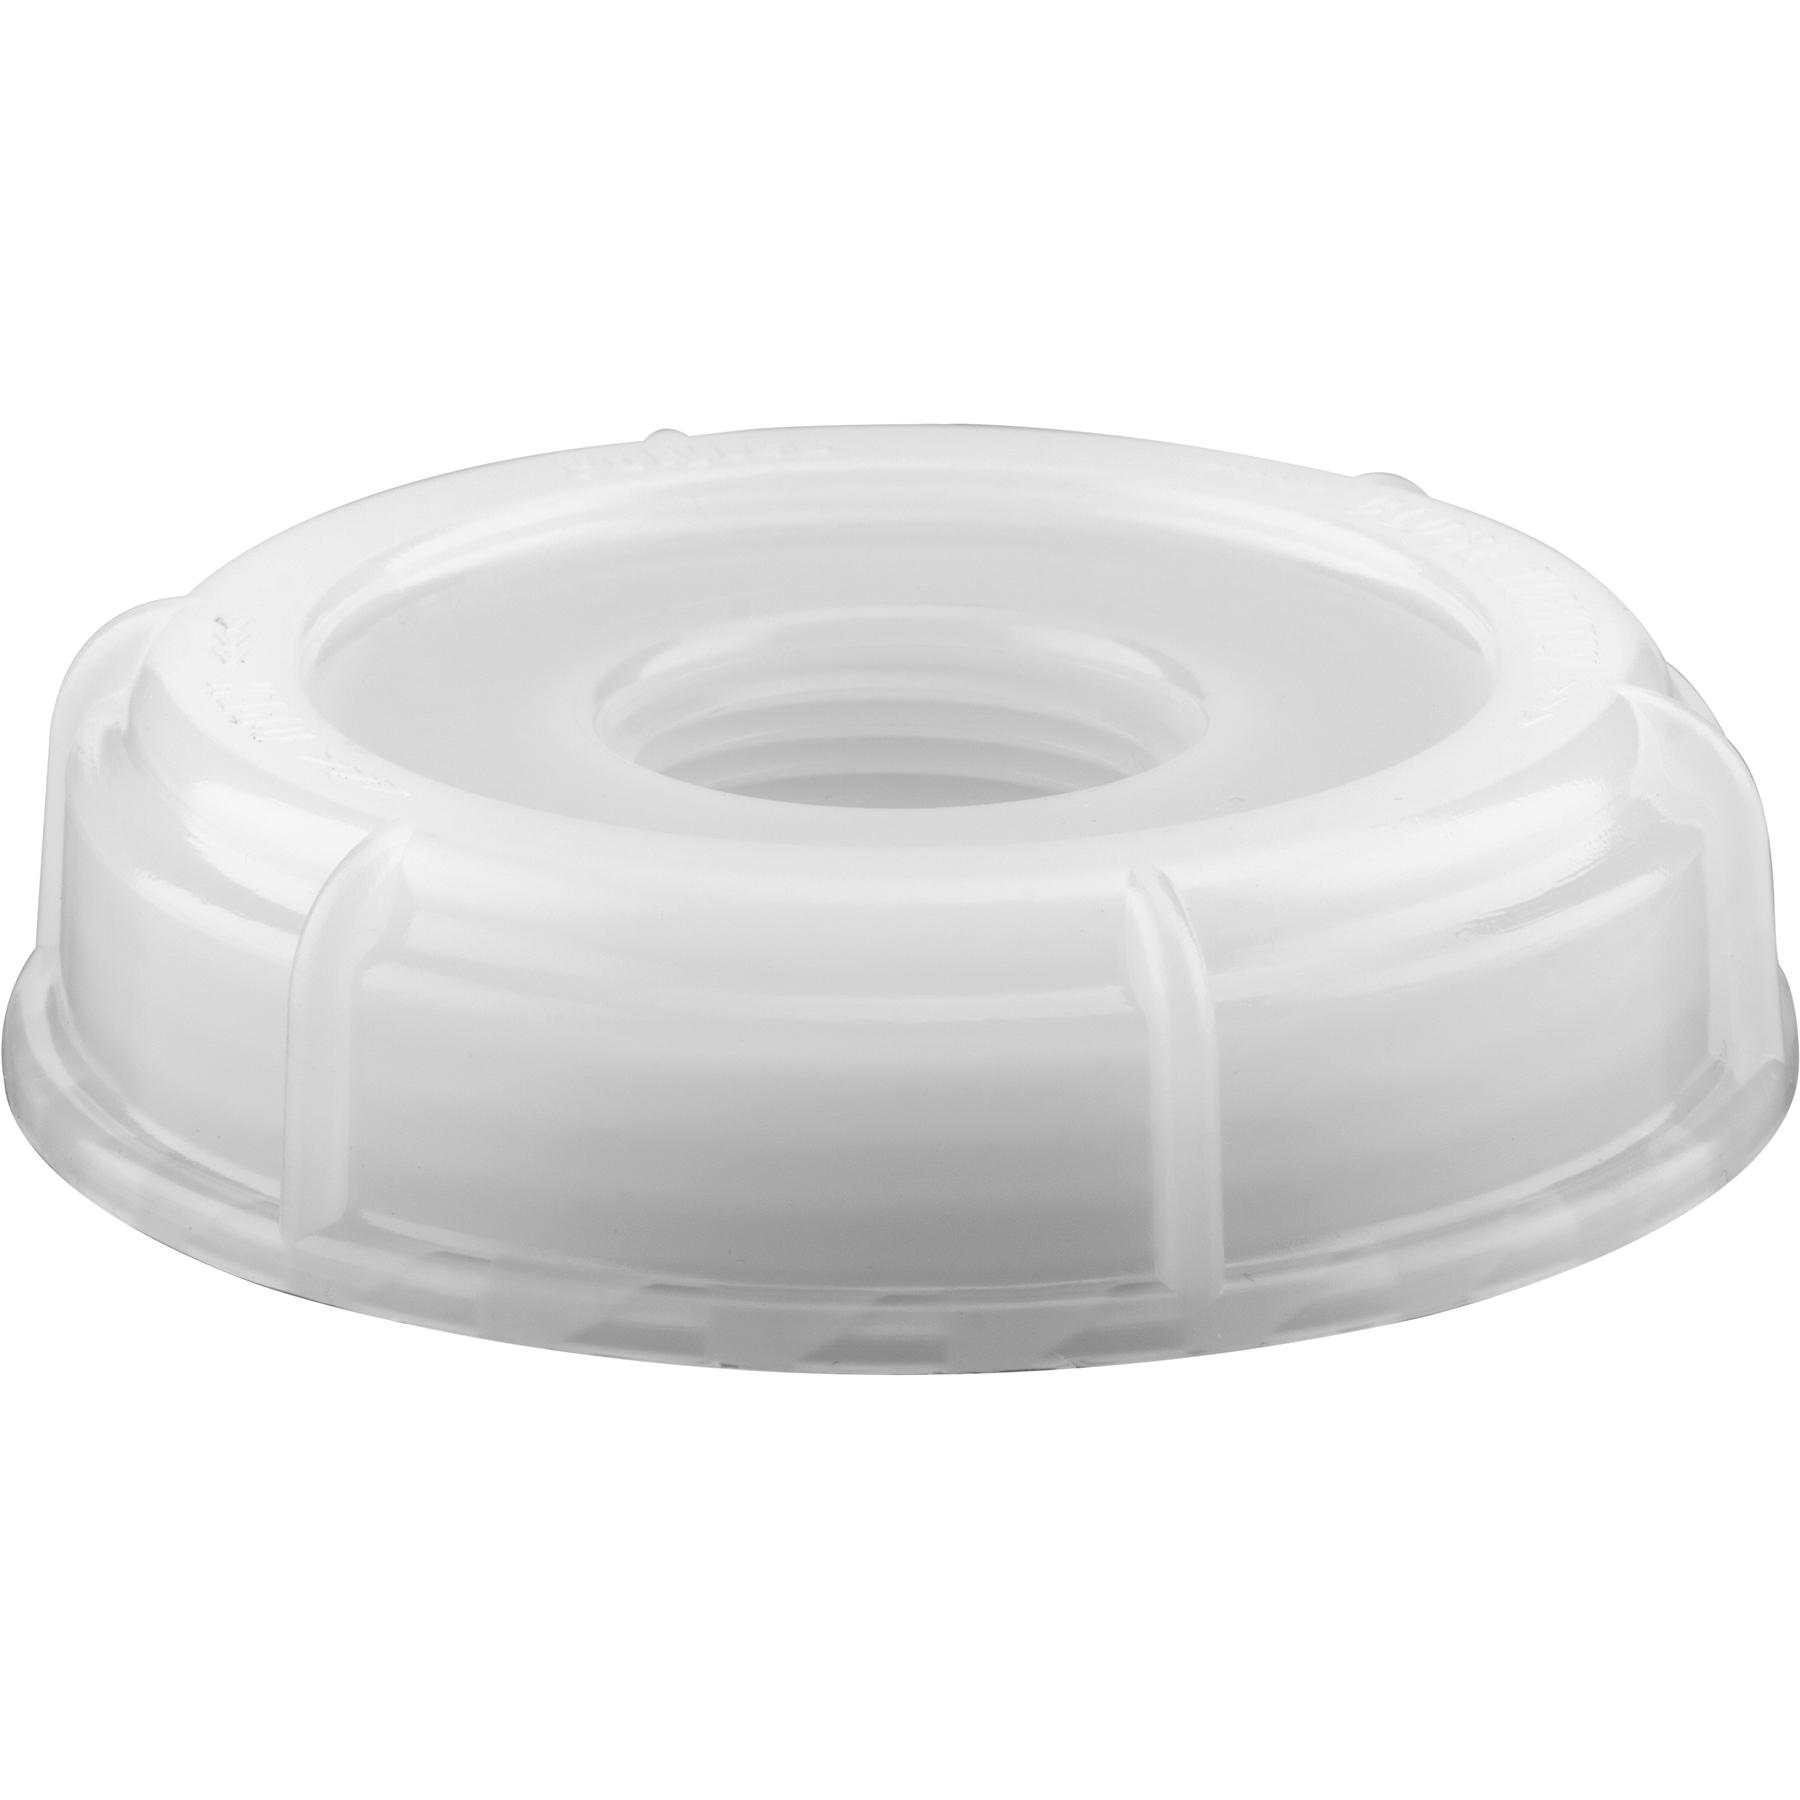 pc 70 70mm 8tpi plastic screw cap with 3 4 threaded. Black Bedroom Furniture Sets. Home Design Ideas